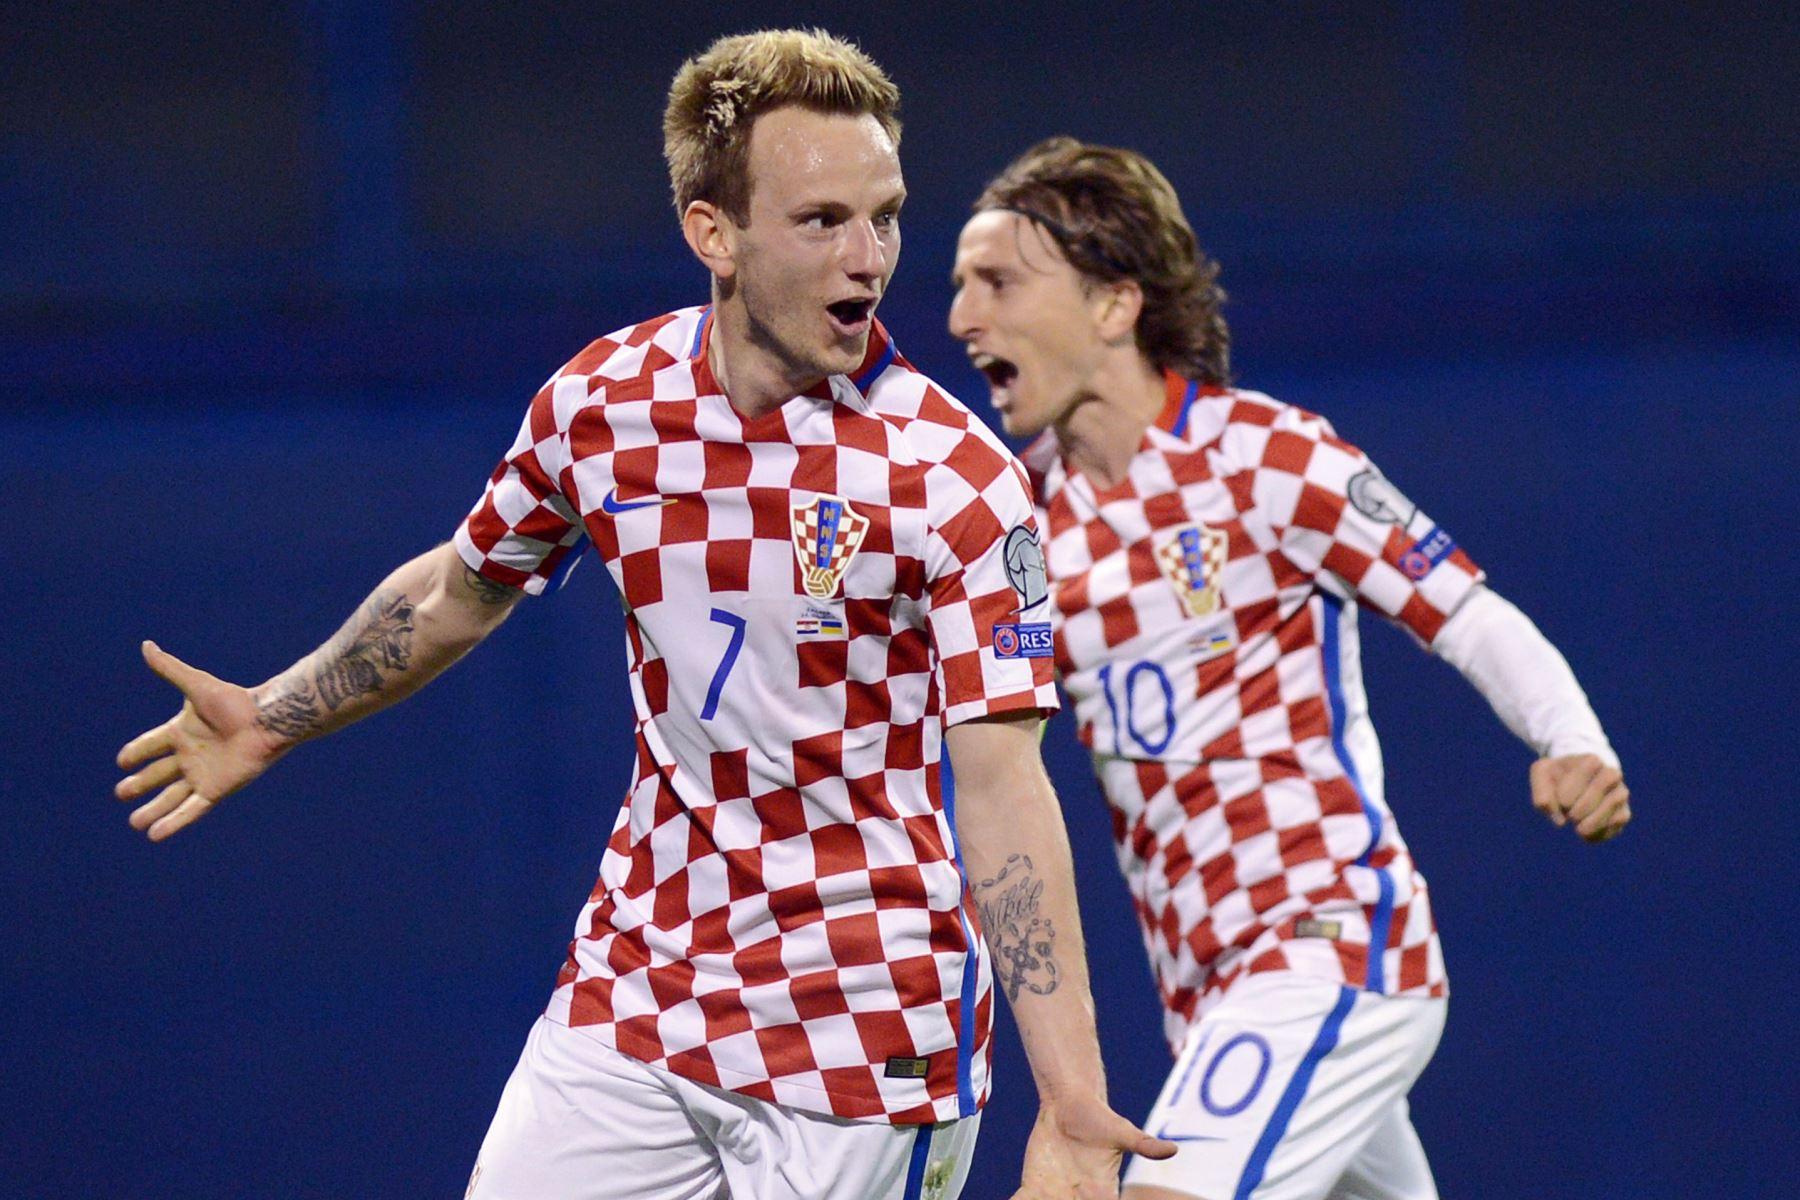 Modric, Rakitic y Mandzukic enfrentarán a la bicolor — Perú vs Croacia